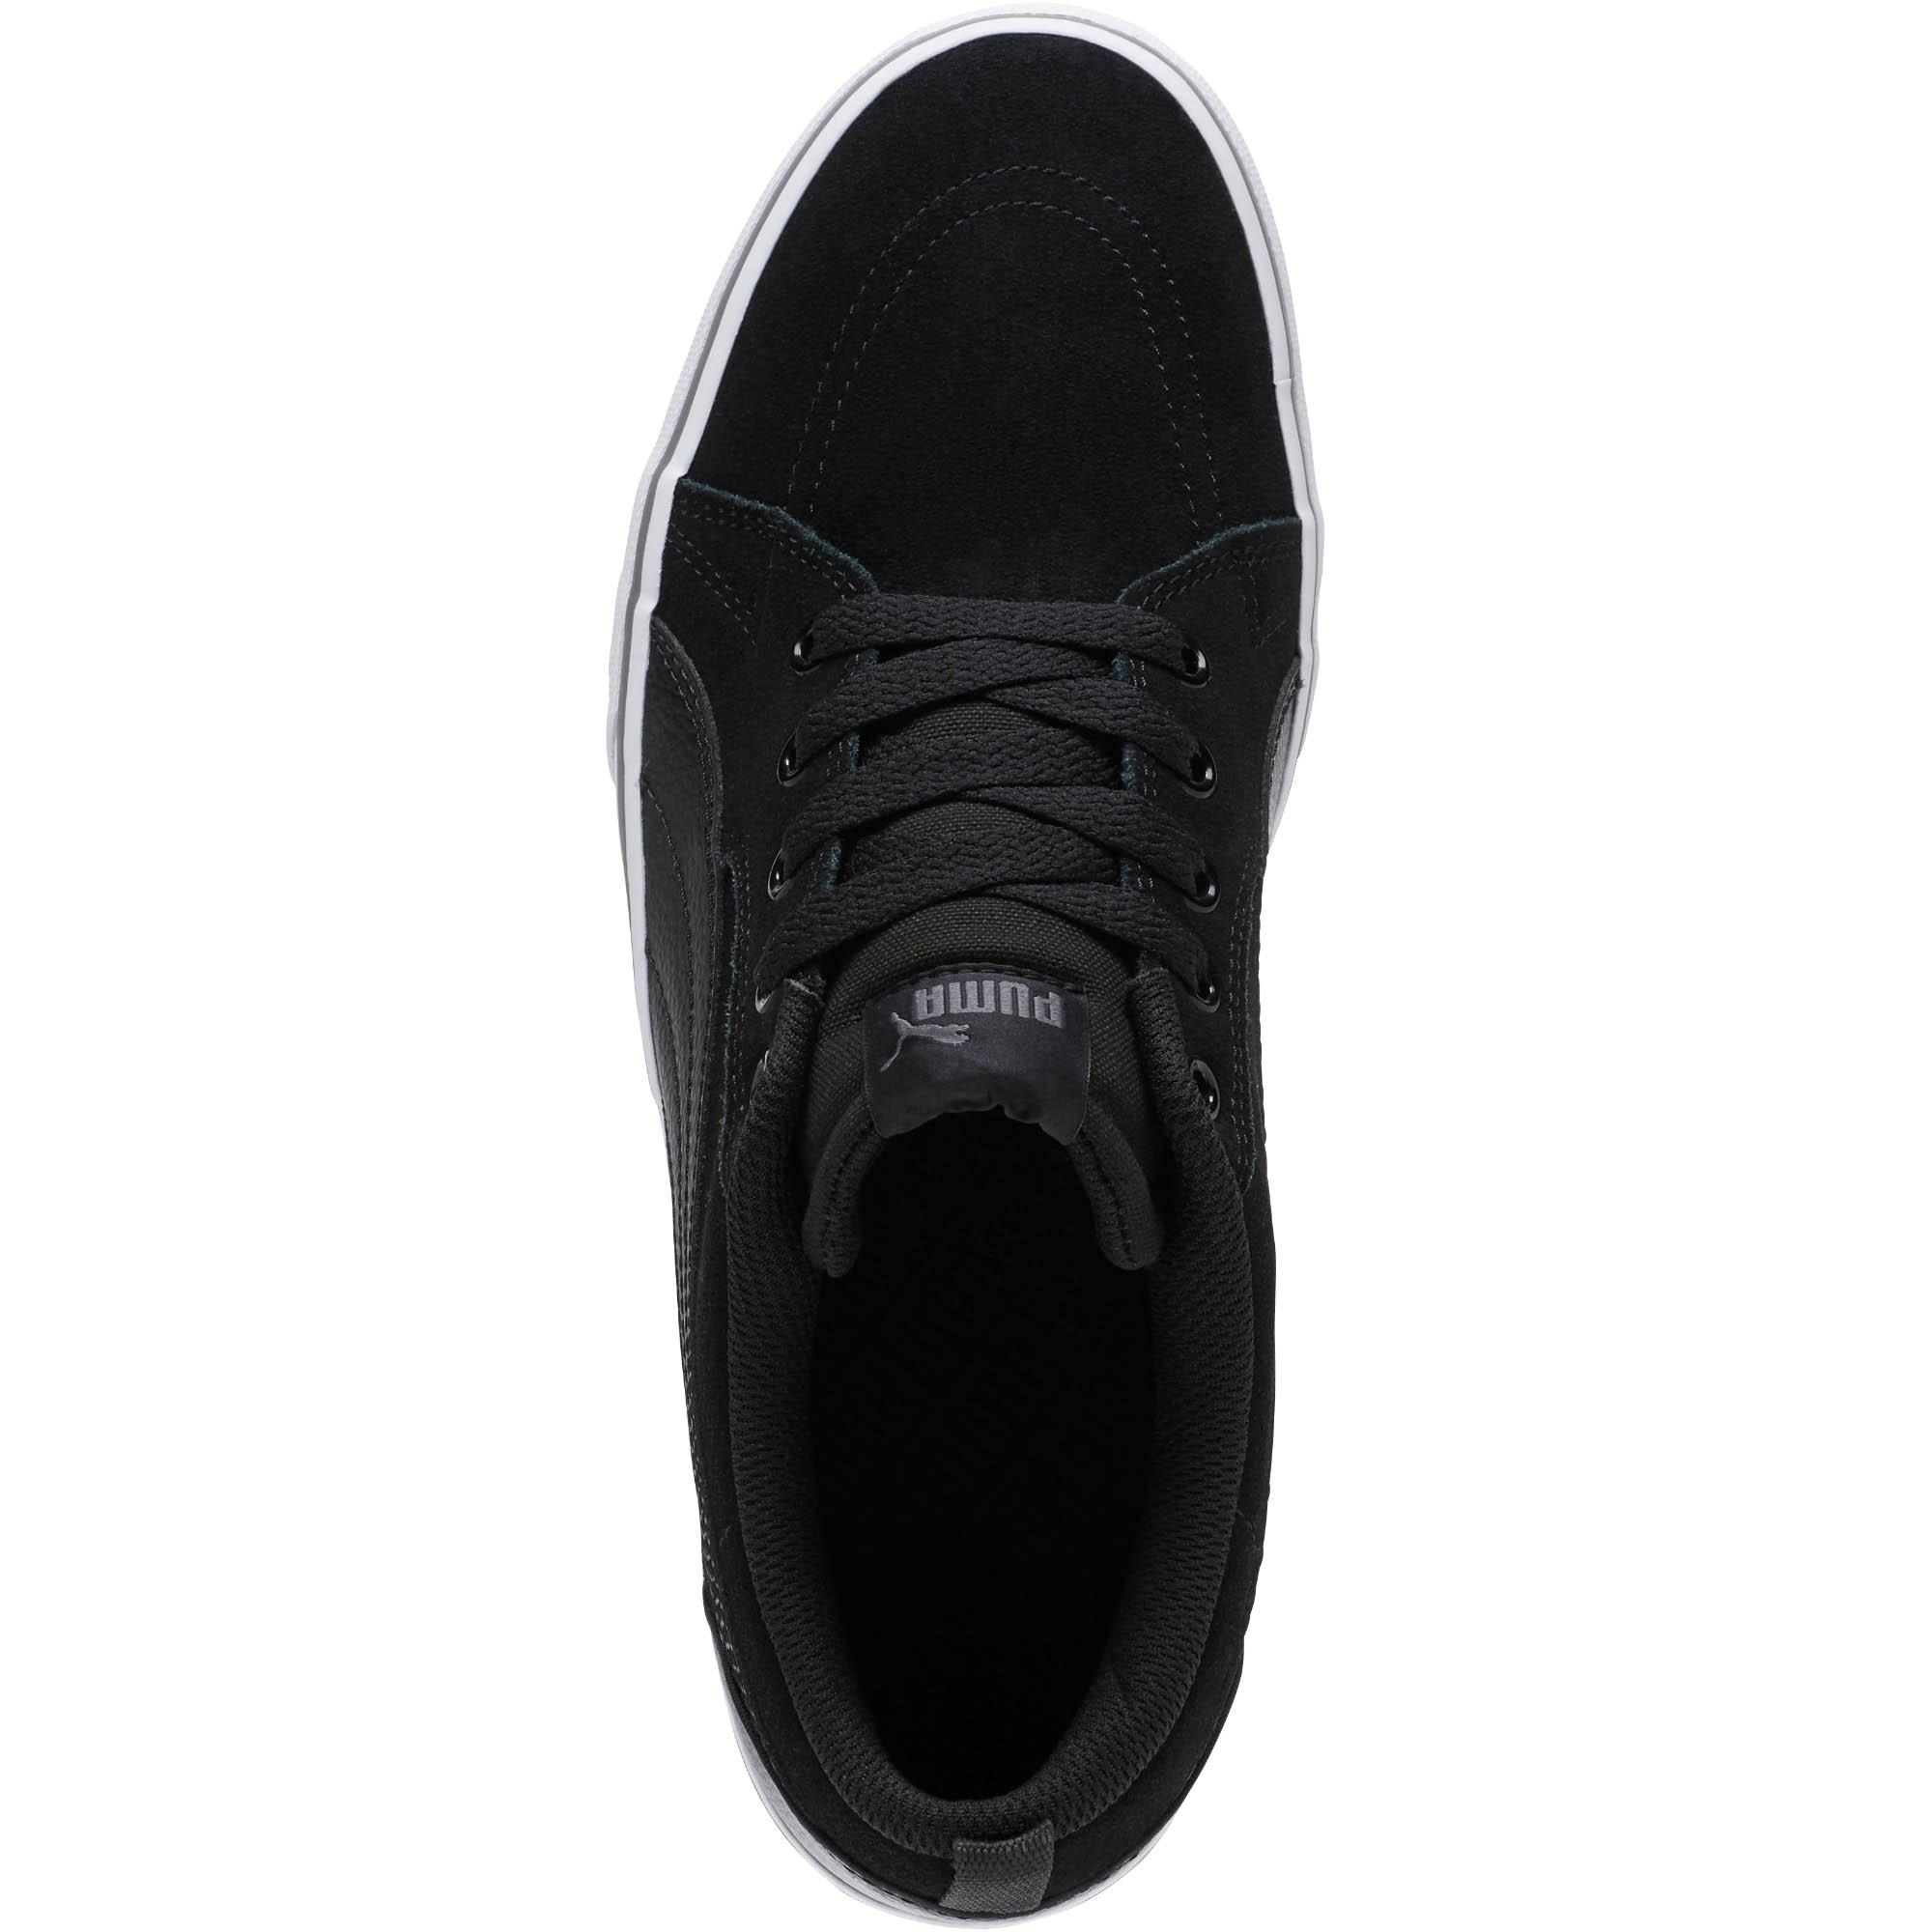 251dd310eac PUMA - Black Bridger Sd Men s Sneakers for Men - Lyst. View fullscreen